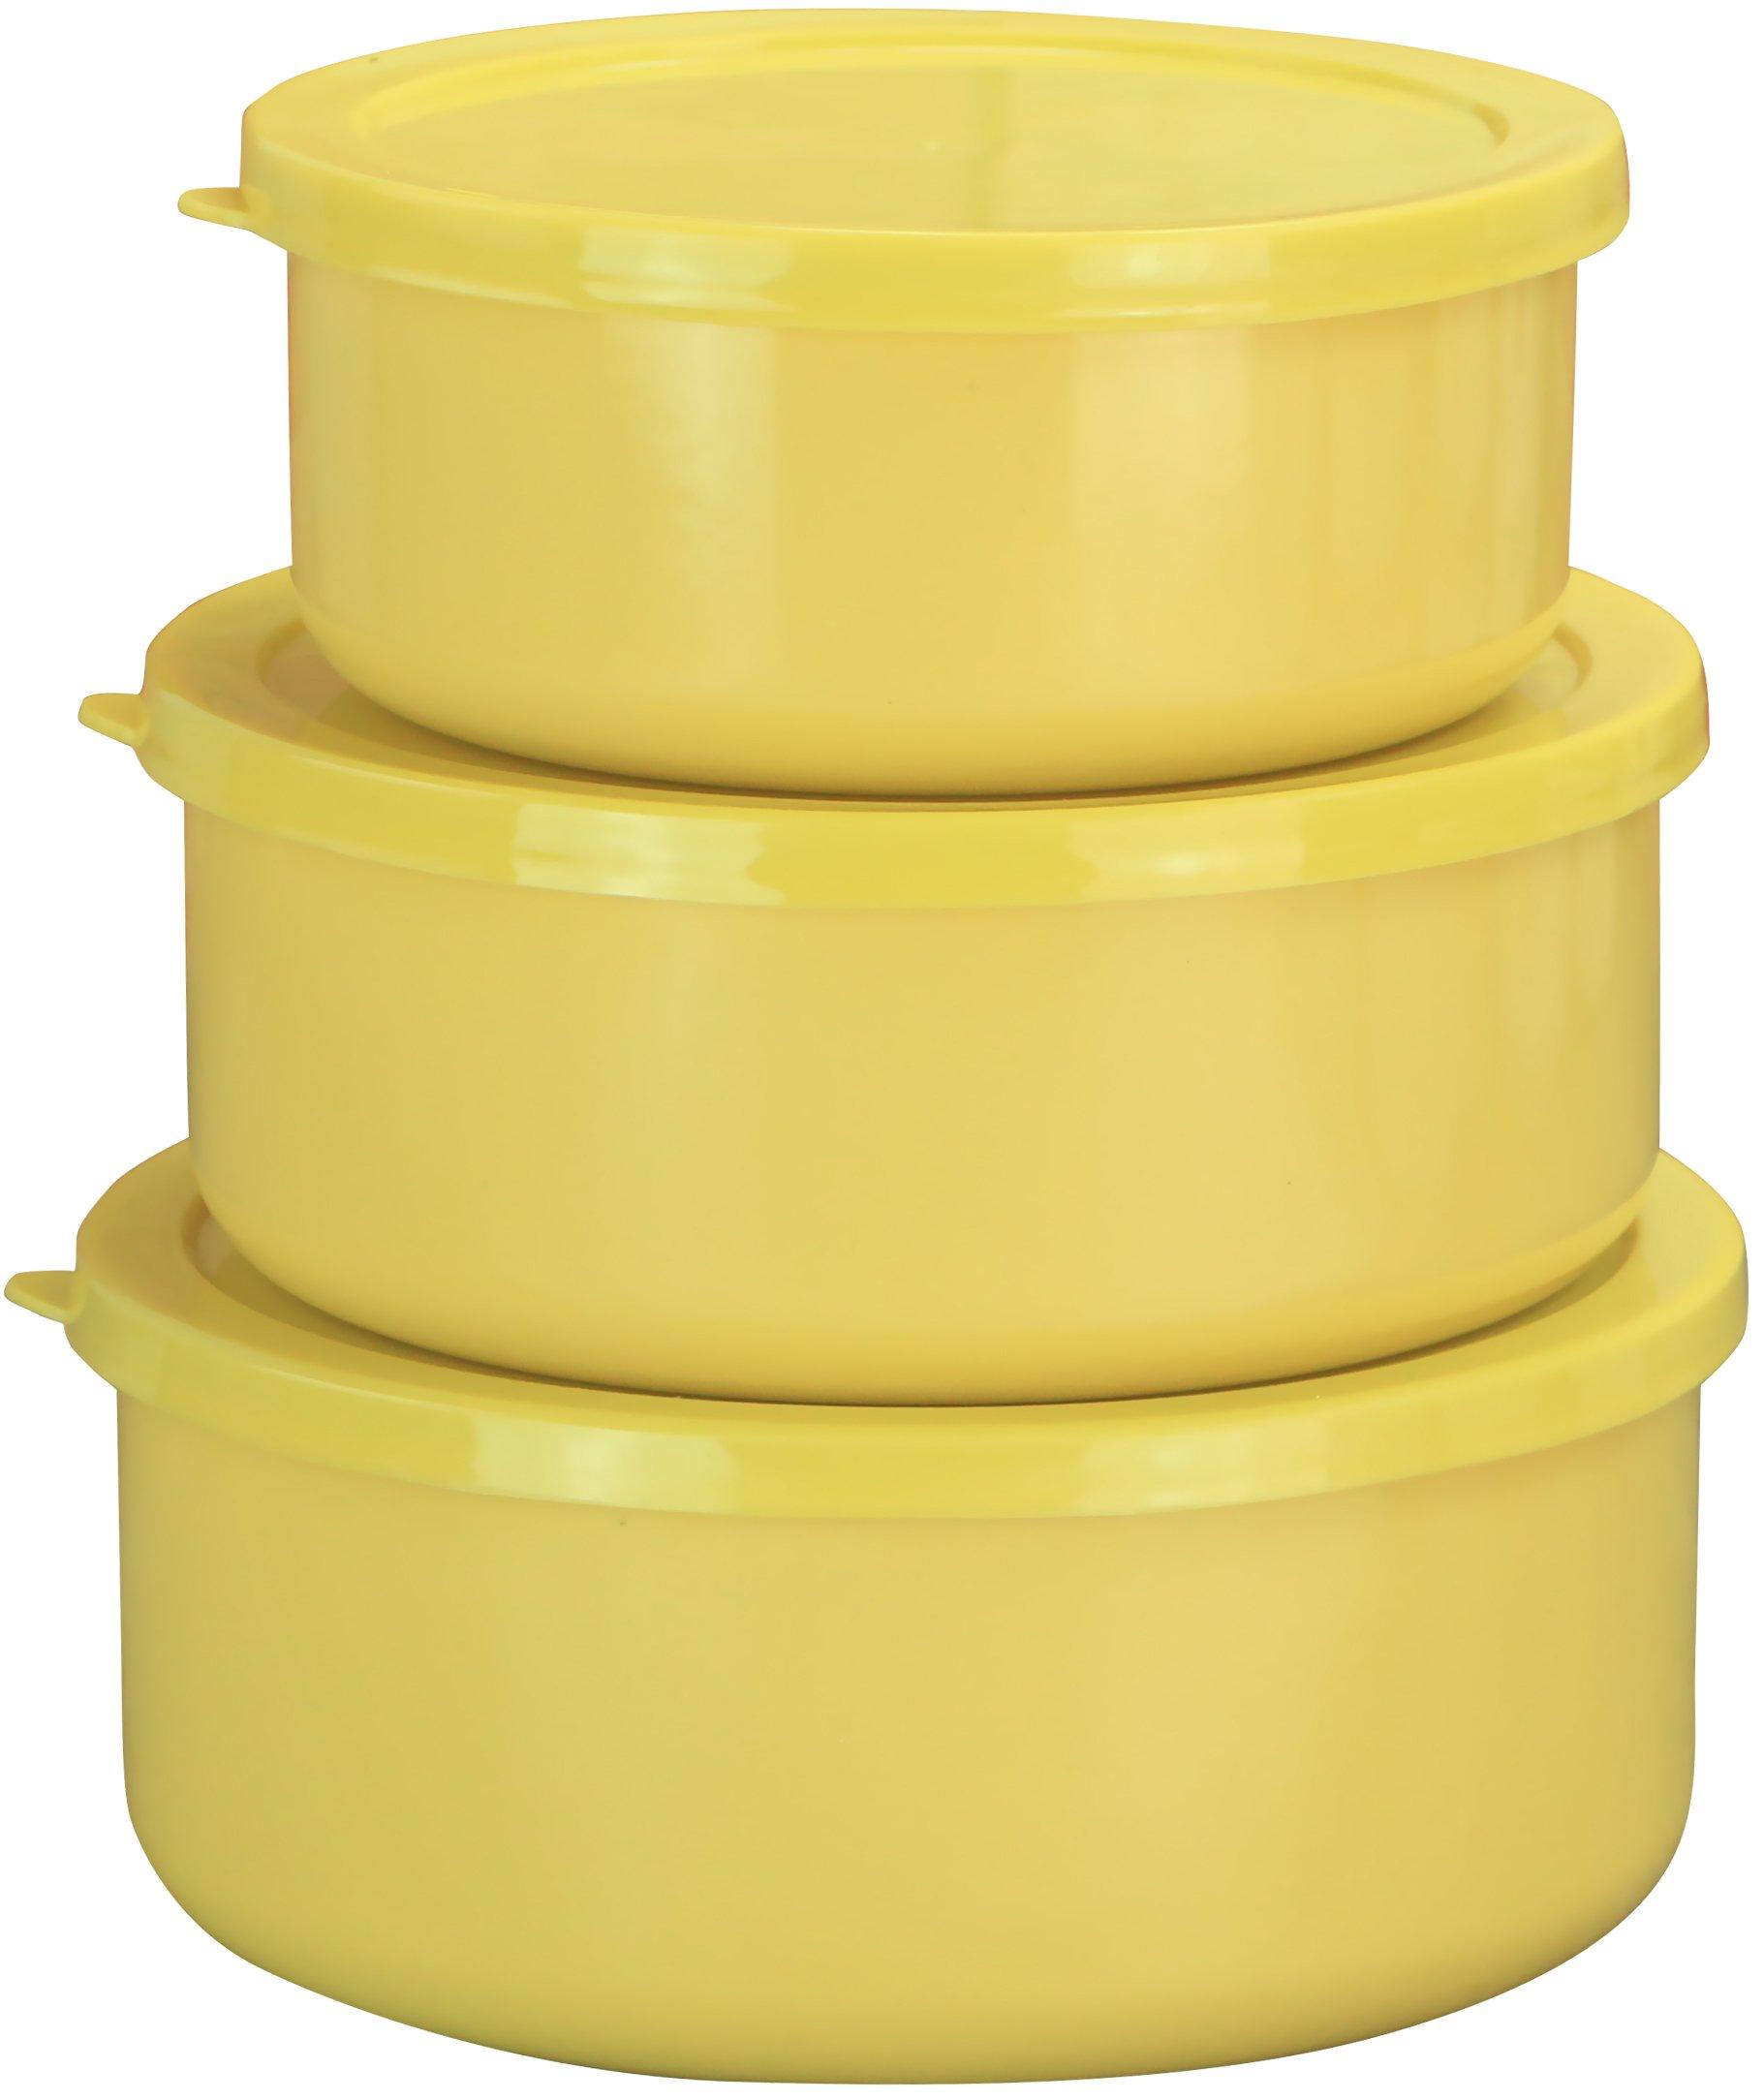 Calypso Basics by Reston Lloyd 6-Piece Enamel on Steel Bowl/Storage Set, Lemon